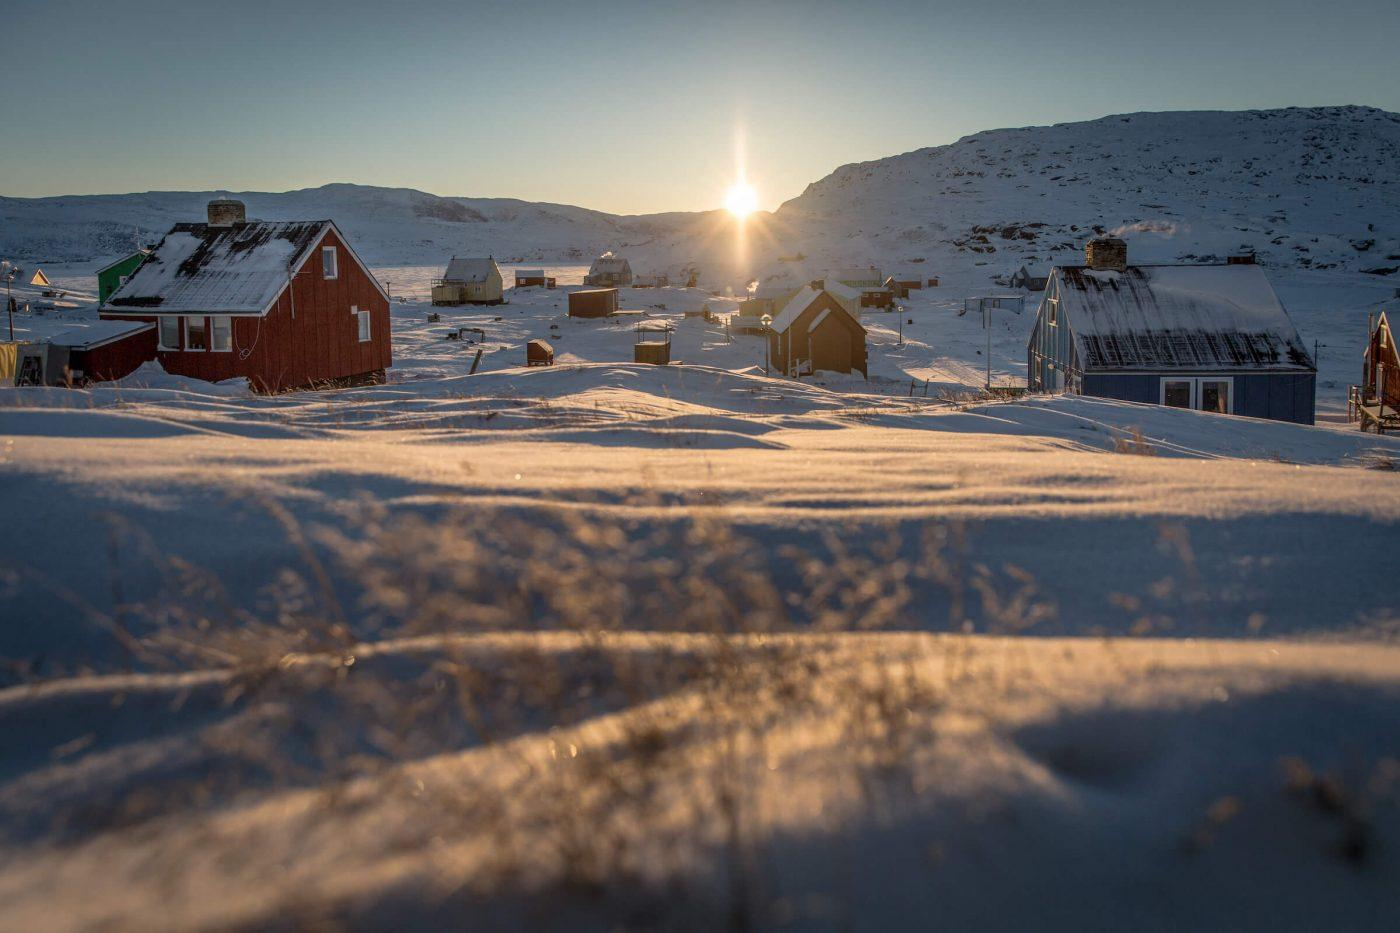 Sunrise over the village Oqaatsut in North Greenland near Ilulissat in the Disko Bay